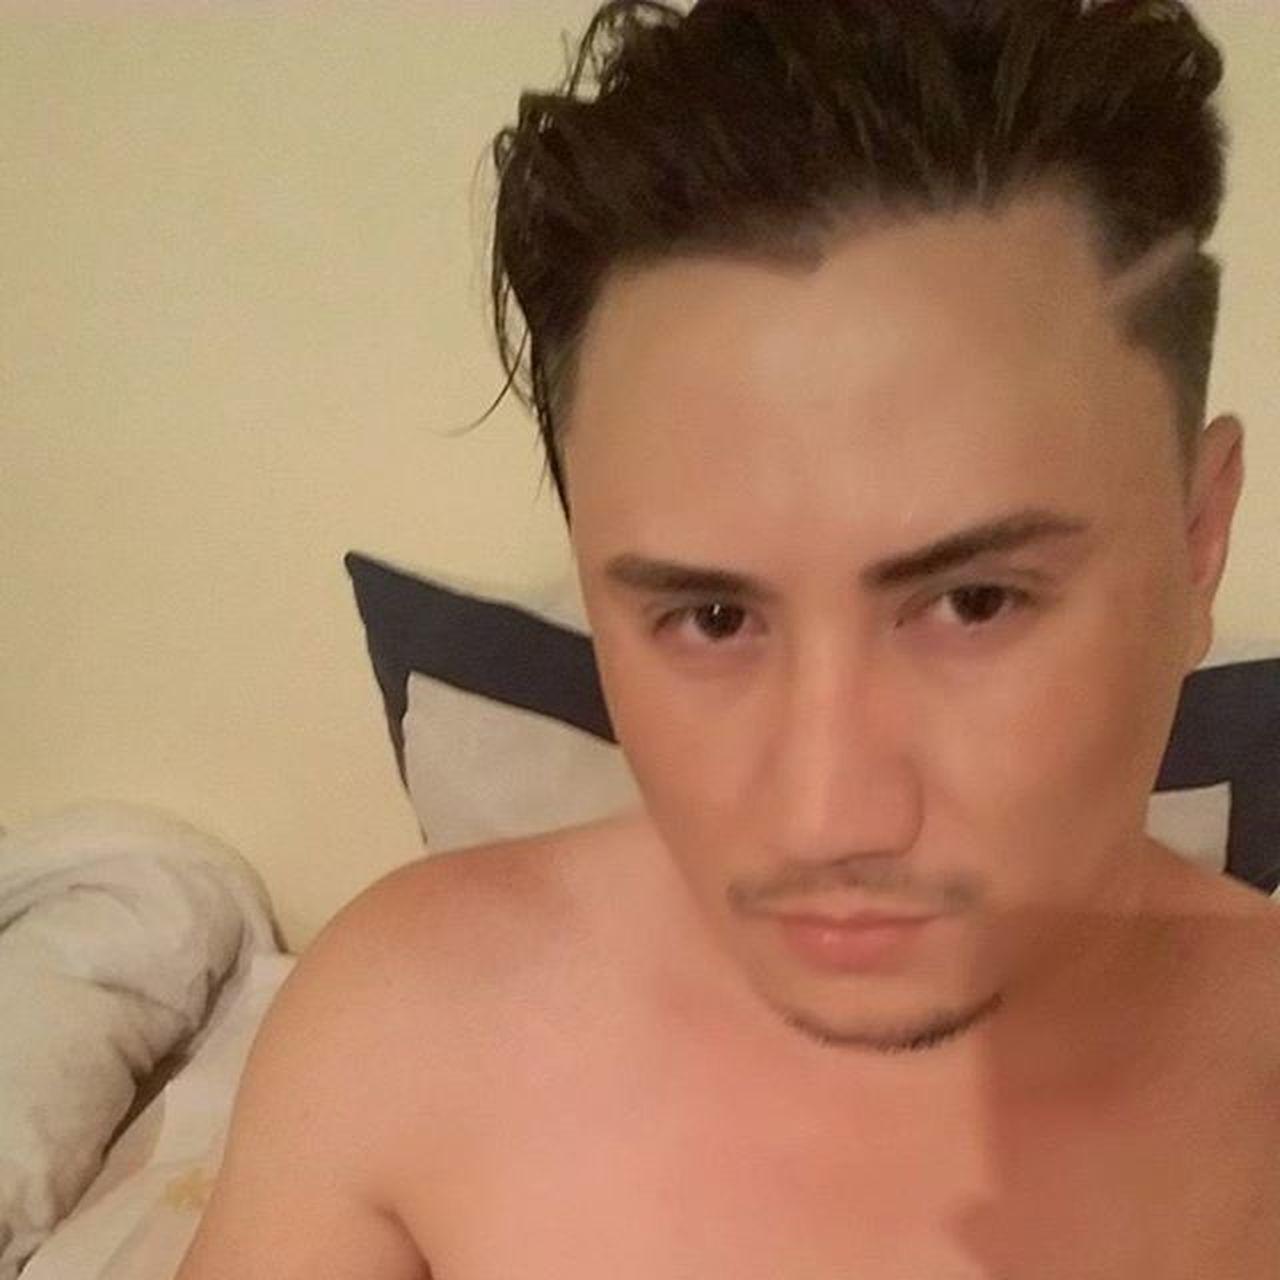 Sexybodies Sexyboys Hunkguys Bulto Papi Papito Asianboy Asianguys Asianguy